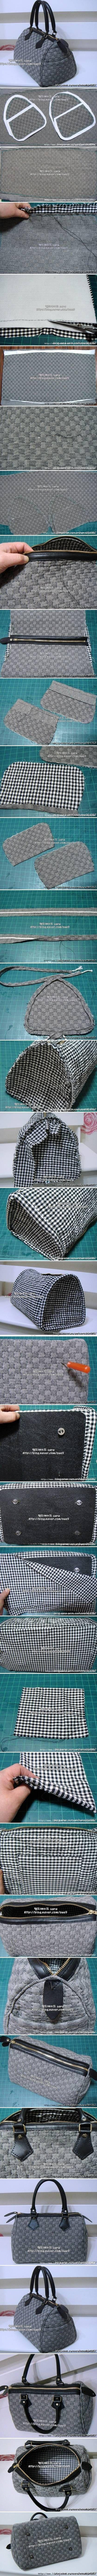 DIY Niza moda bolso DIY Proyectos | UsefulDIY.com